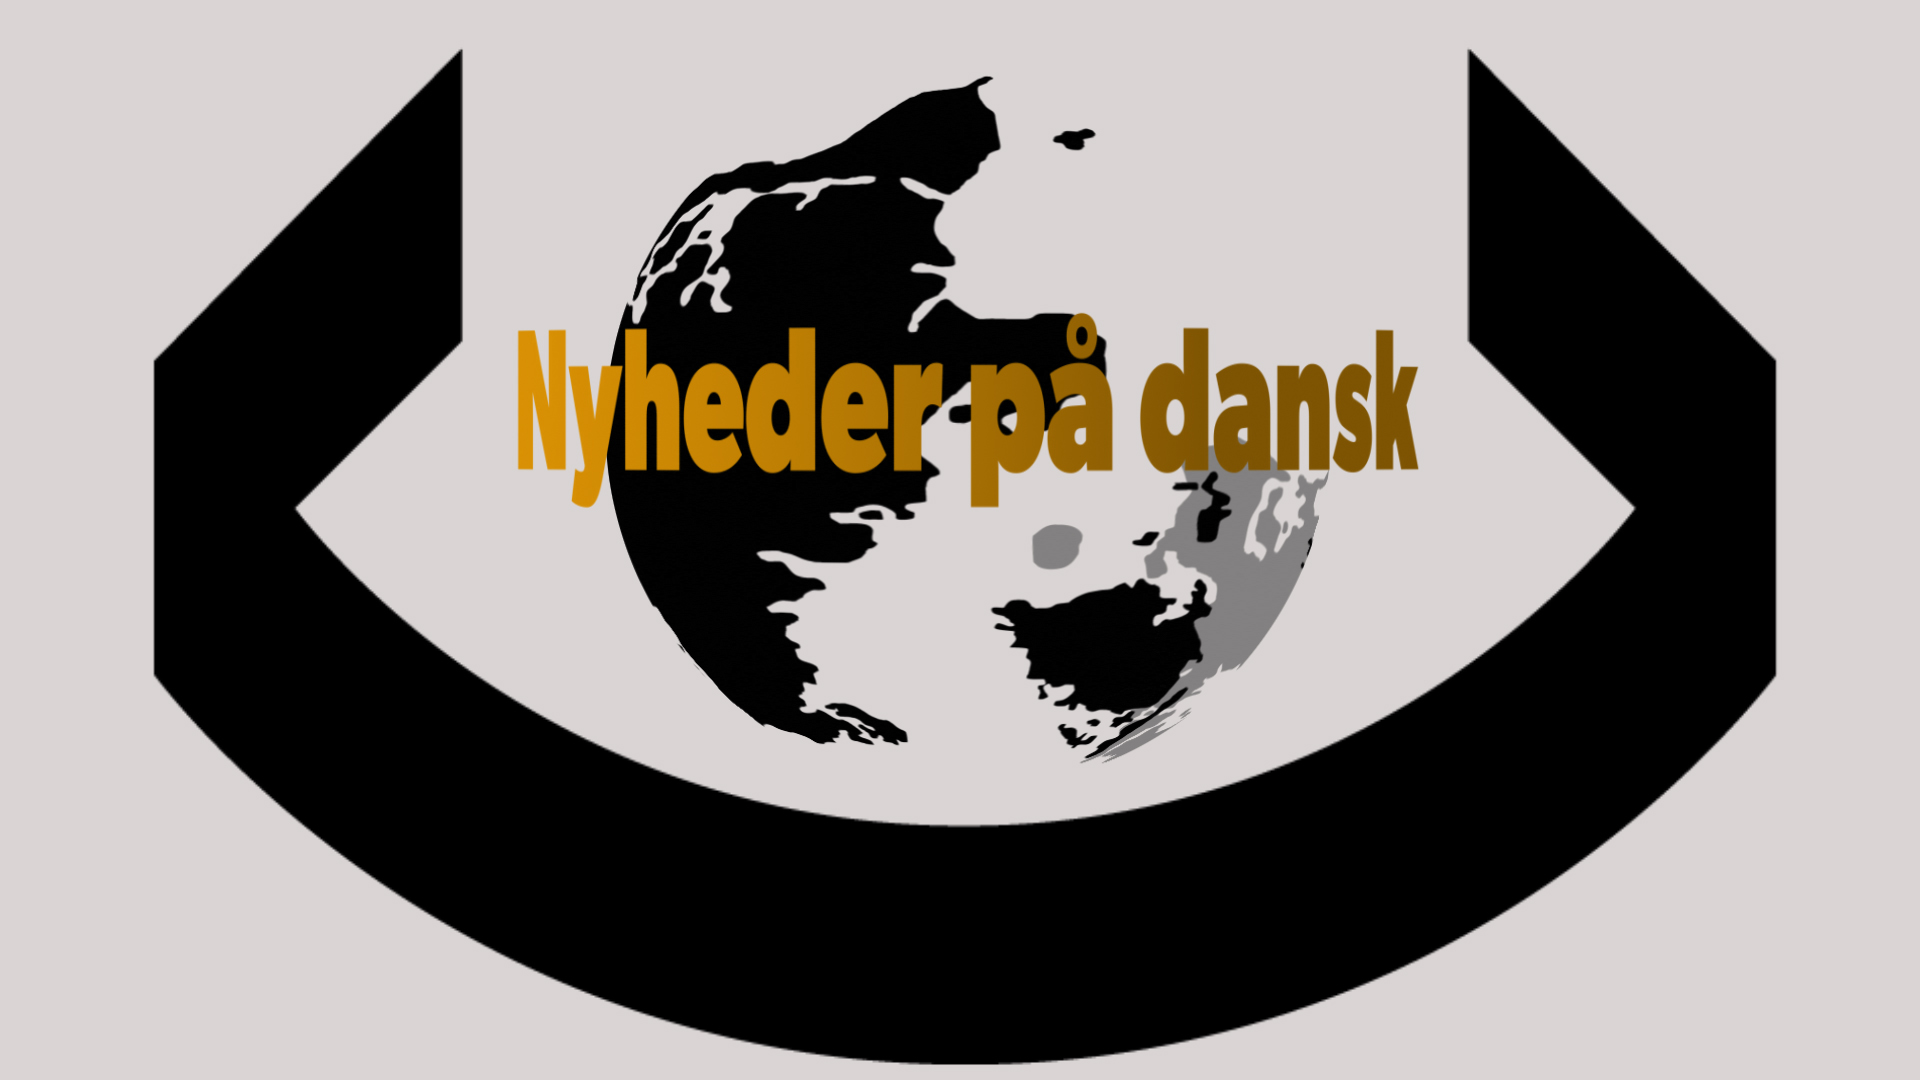 nyhederpaadansk_logo.jpg